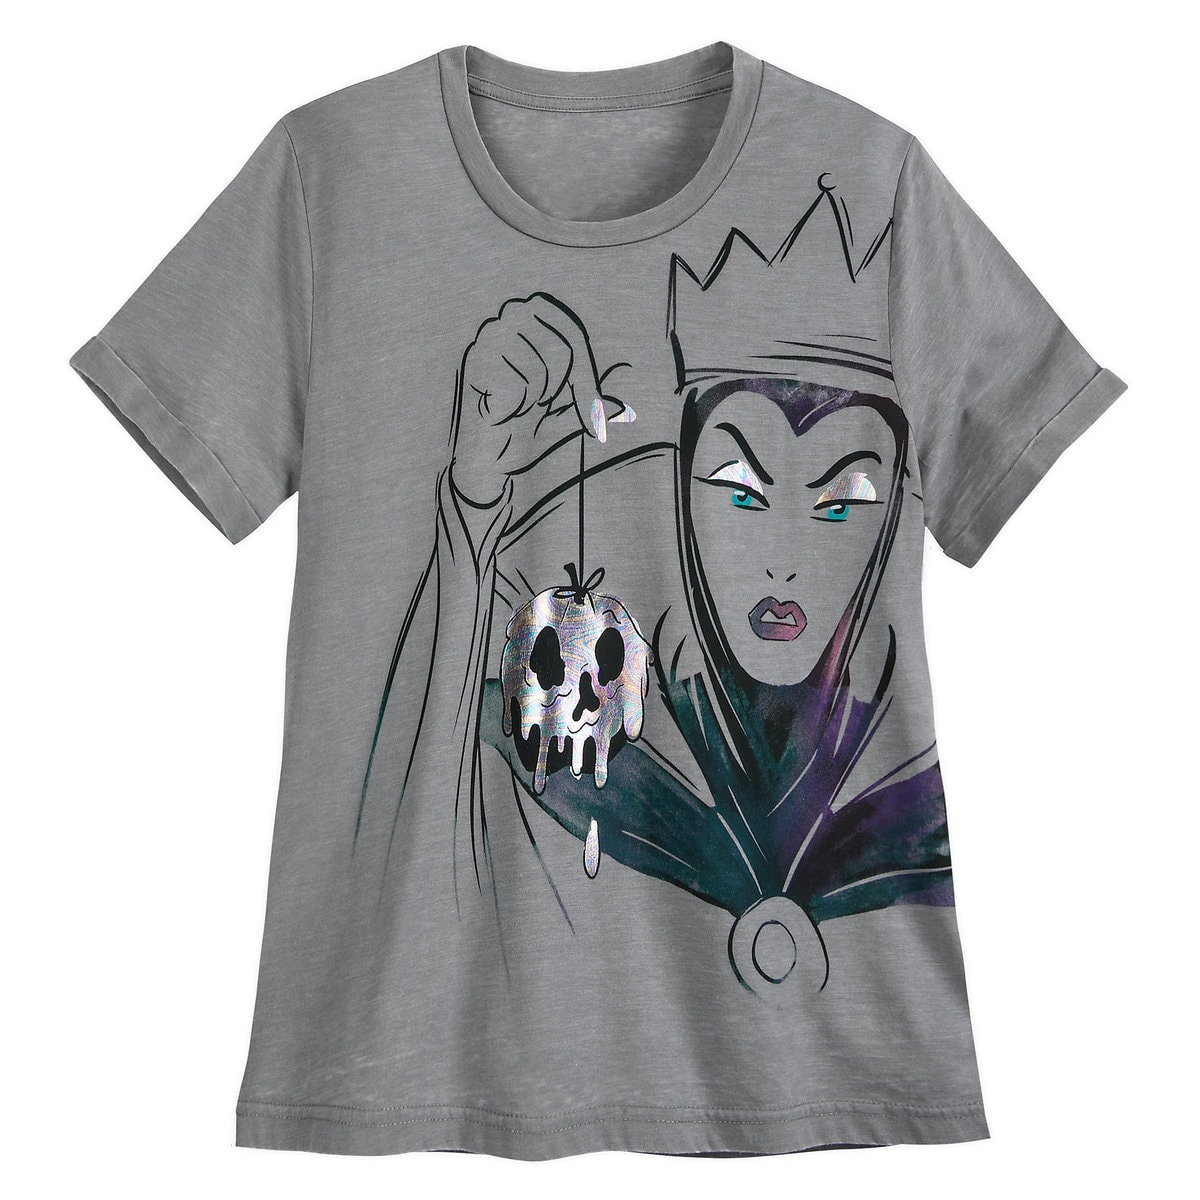 b30c94de6a Product Image of Evil Queen Fashion T-Shirt for Women # 1